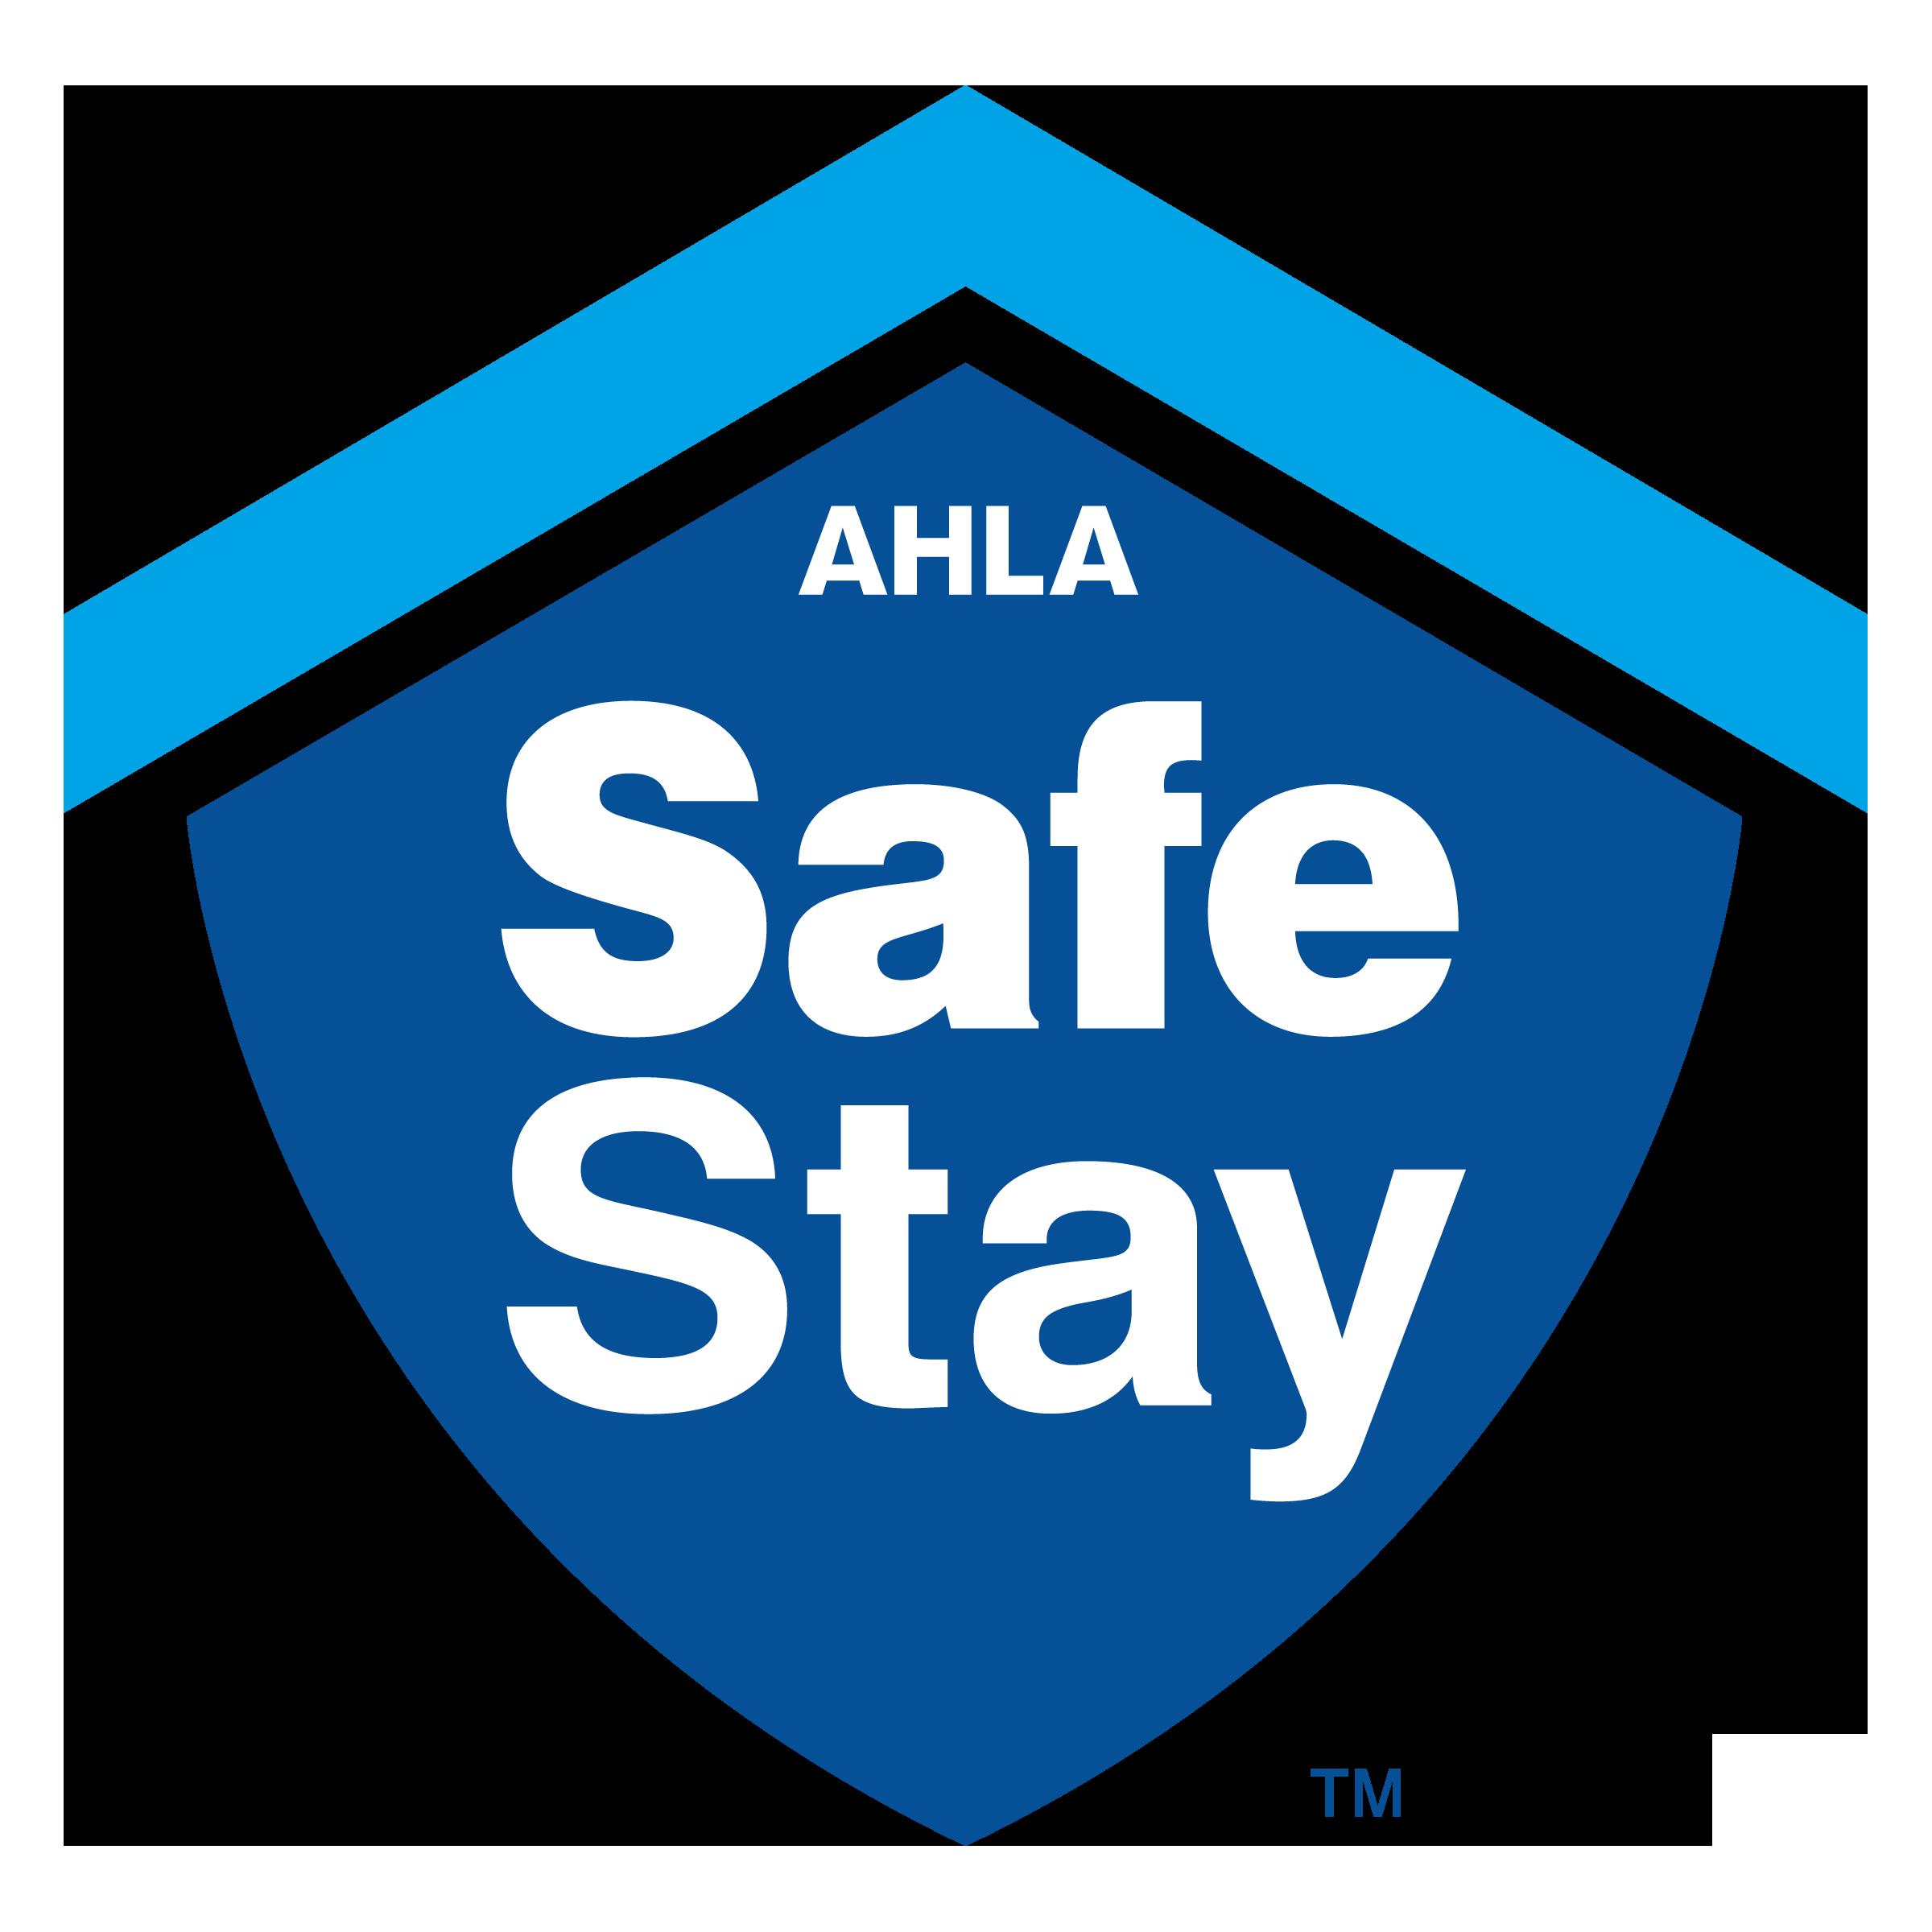 AHLA Stay Safe